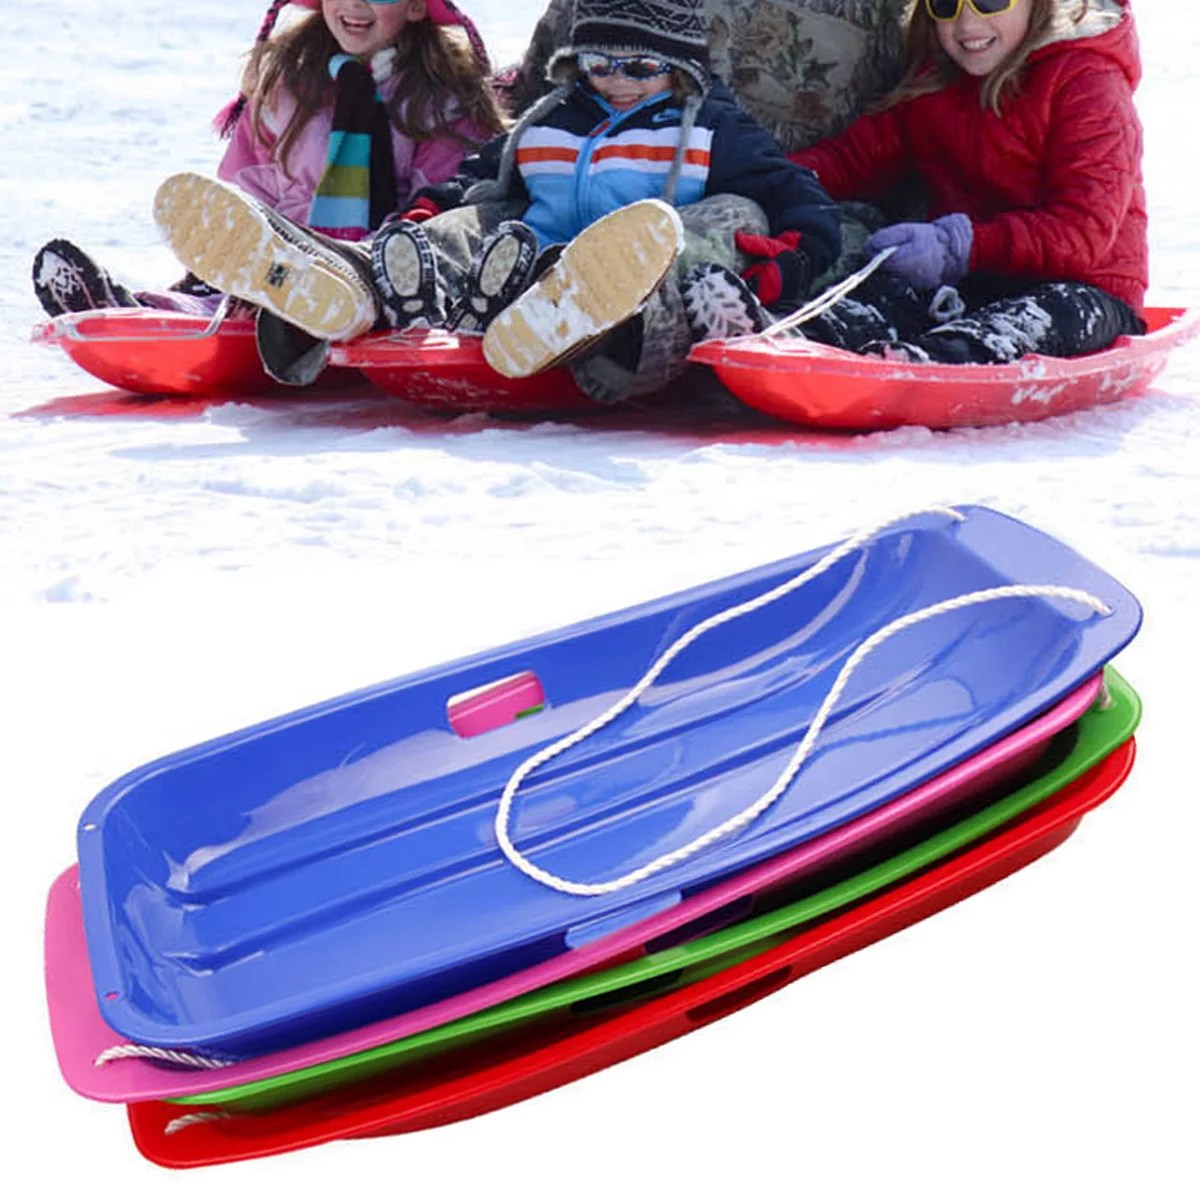 snow sled boat board sledge skiing toboggan plastic for kid children christmas gifts